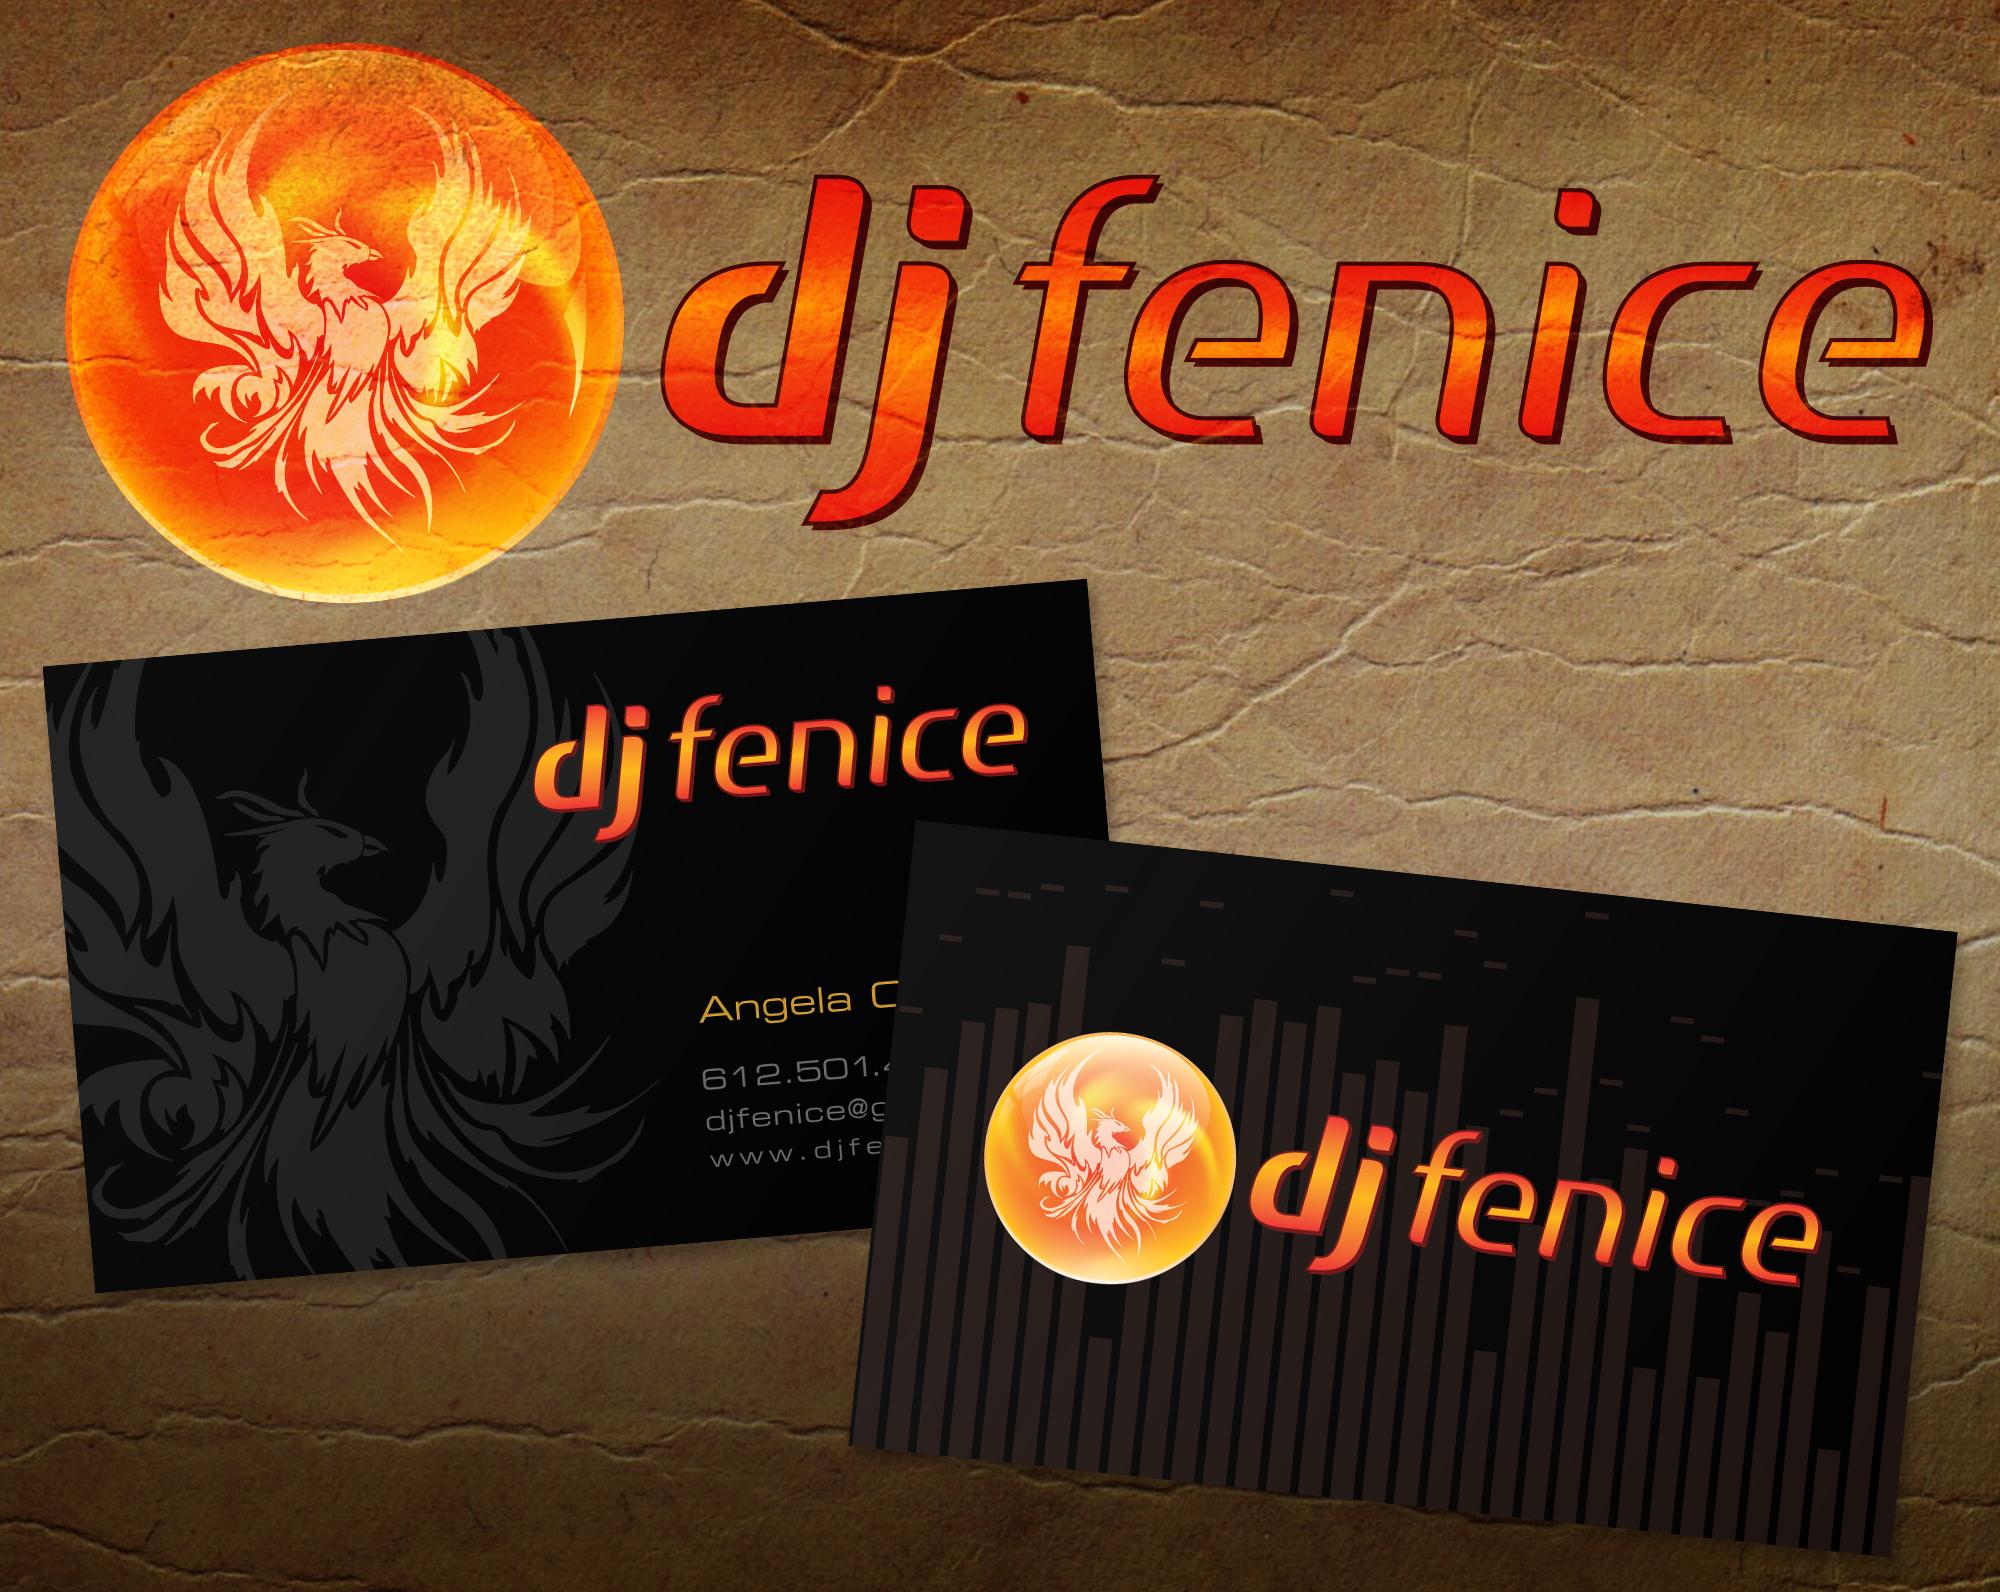 DJ Fenice